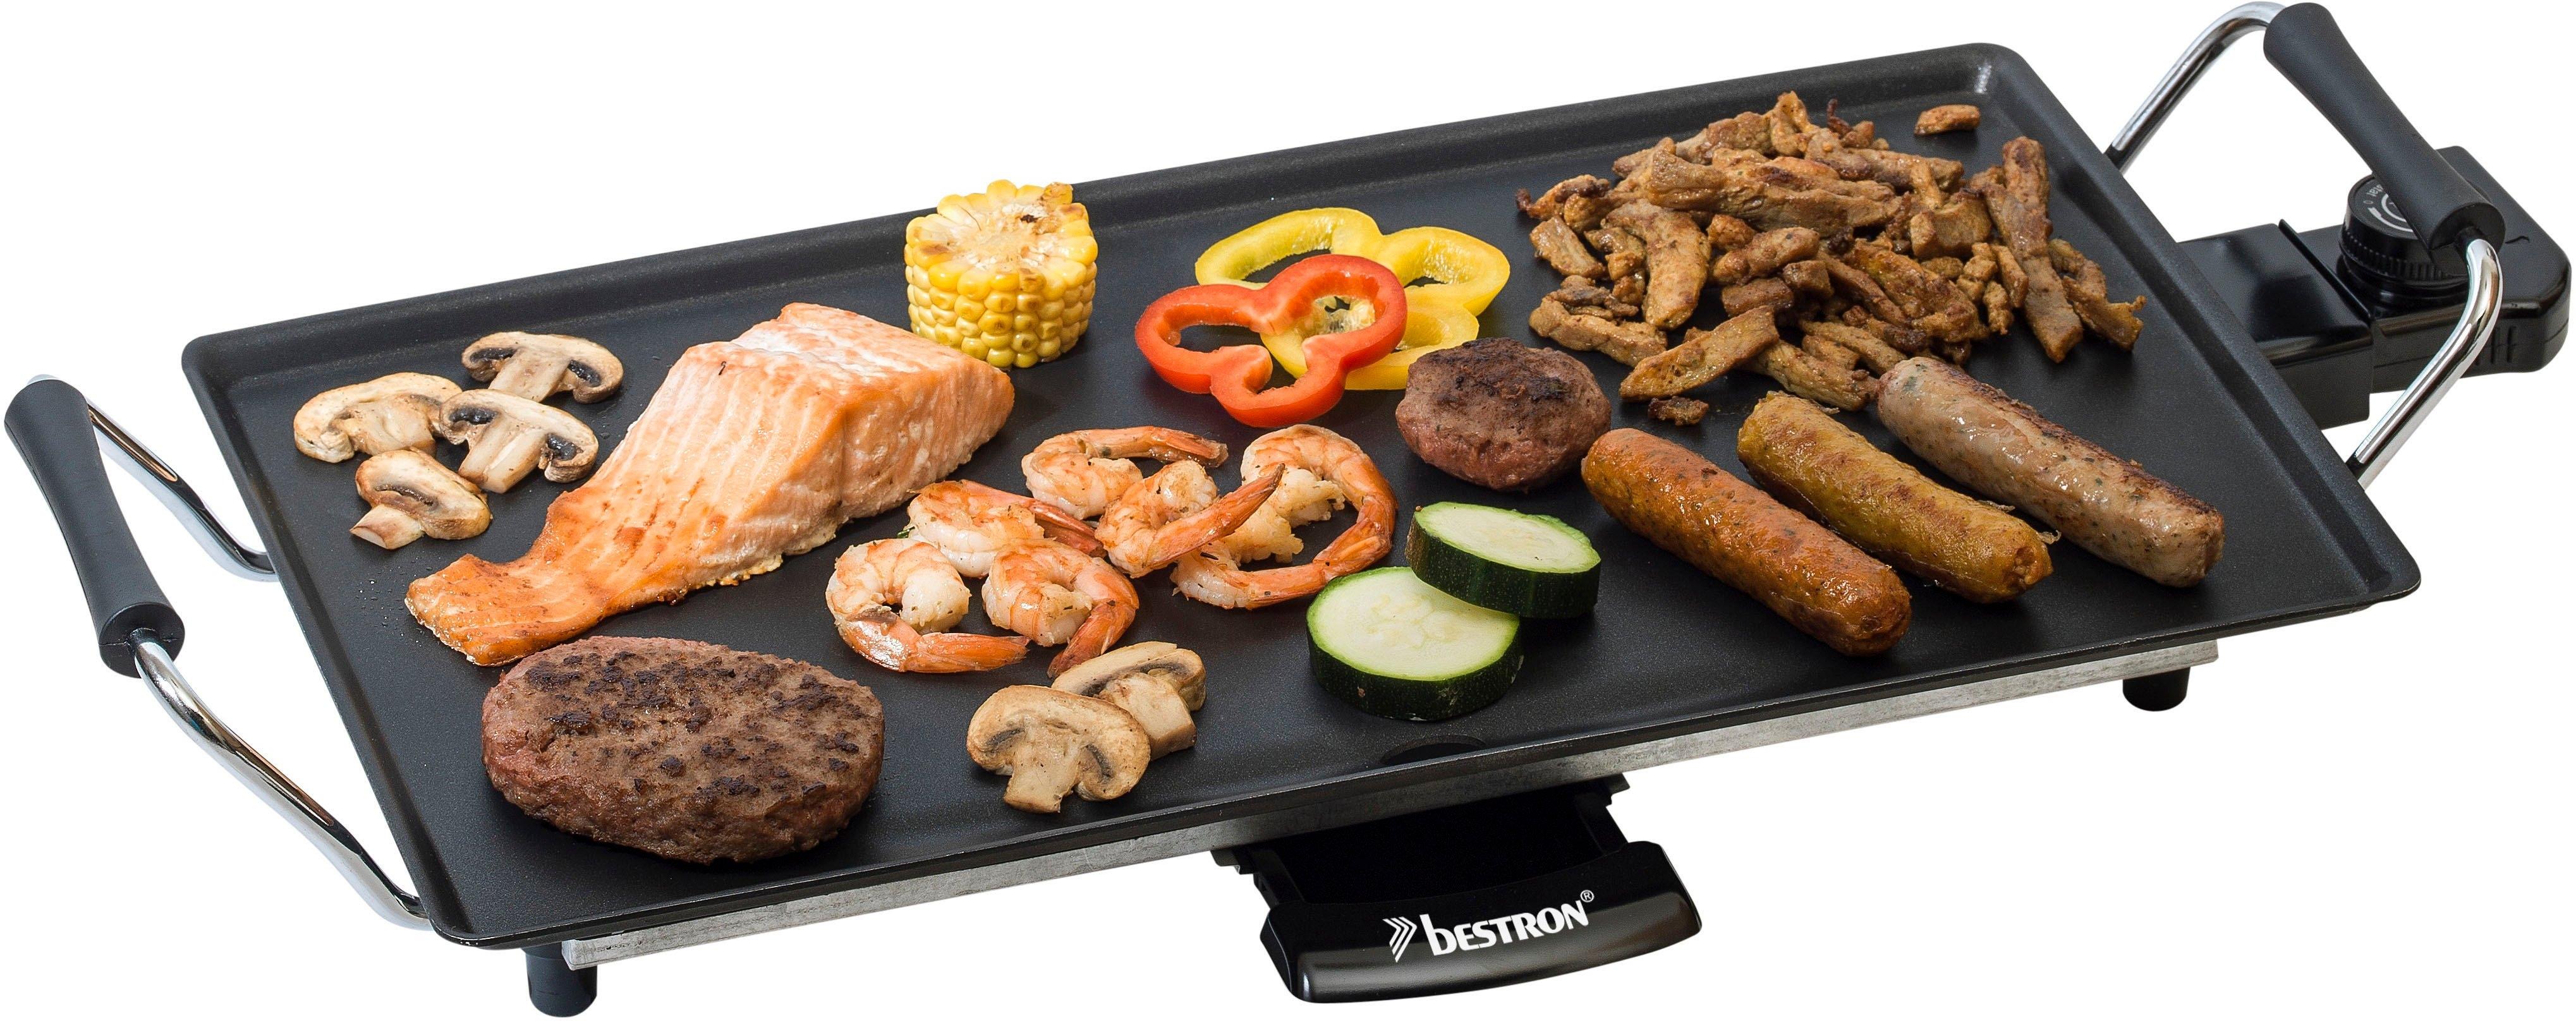 bestron Teppanyaki-grill ABP602 nu online bestellen